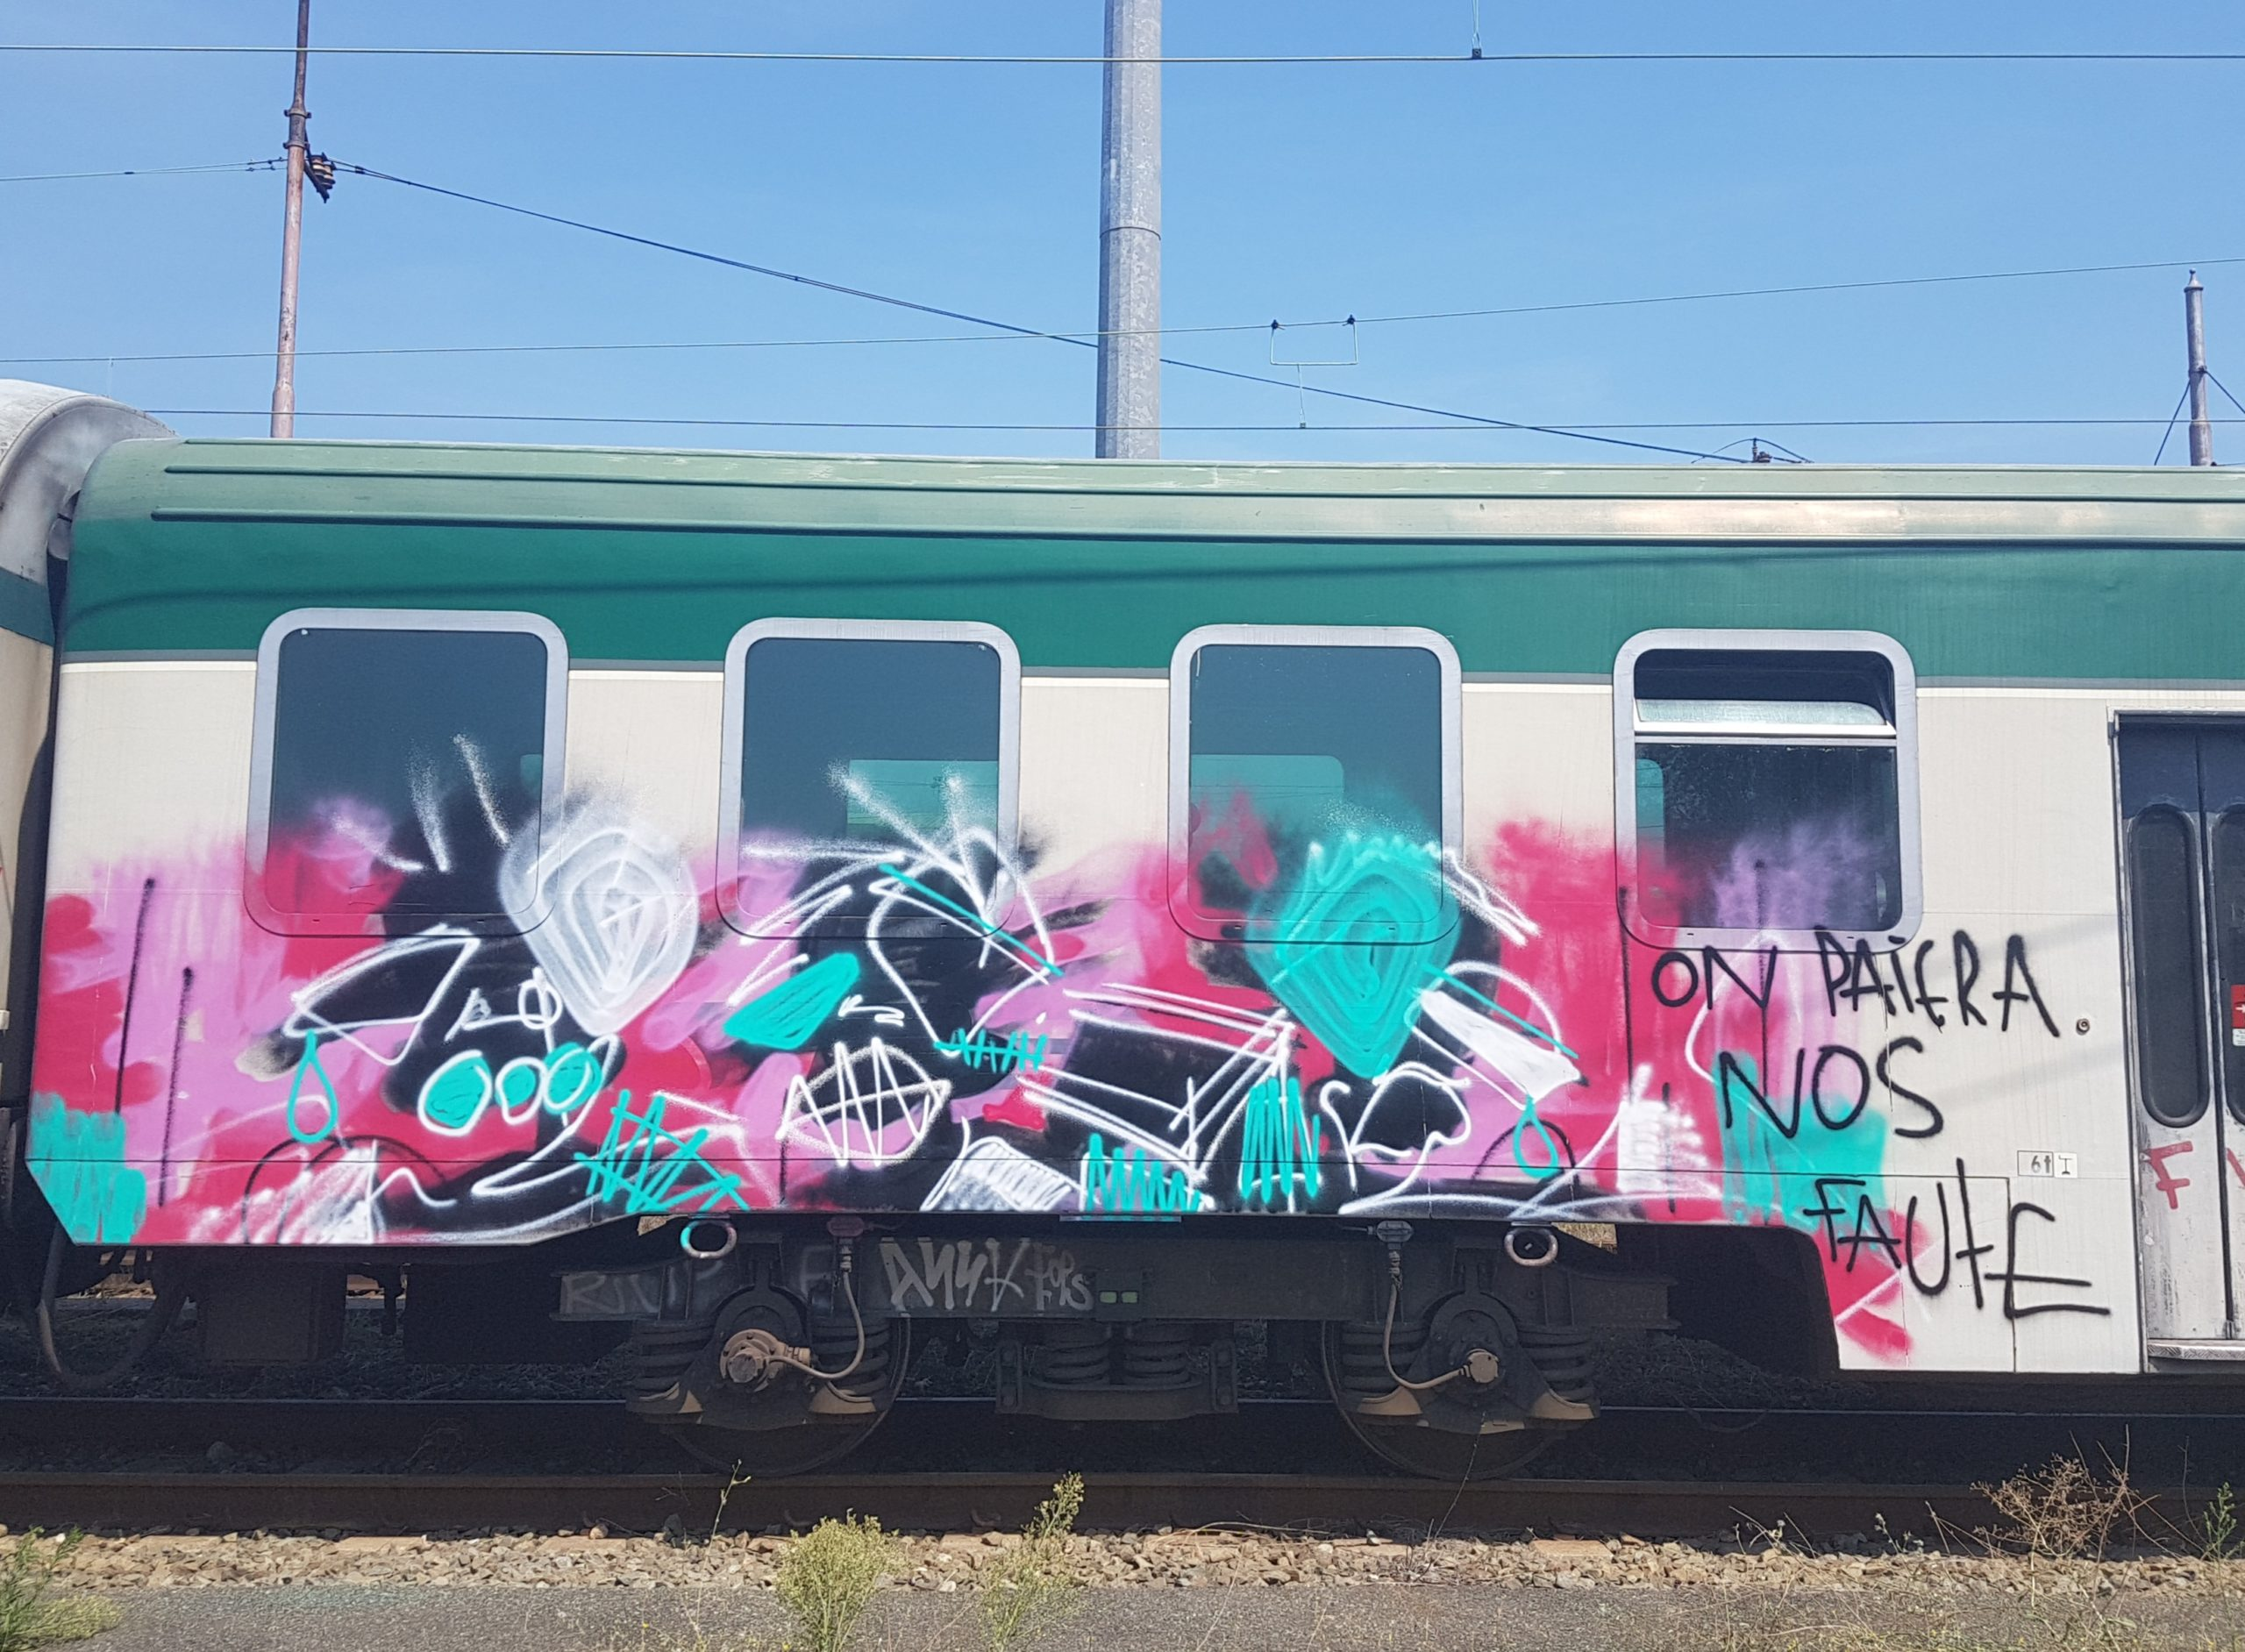 Krade train